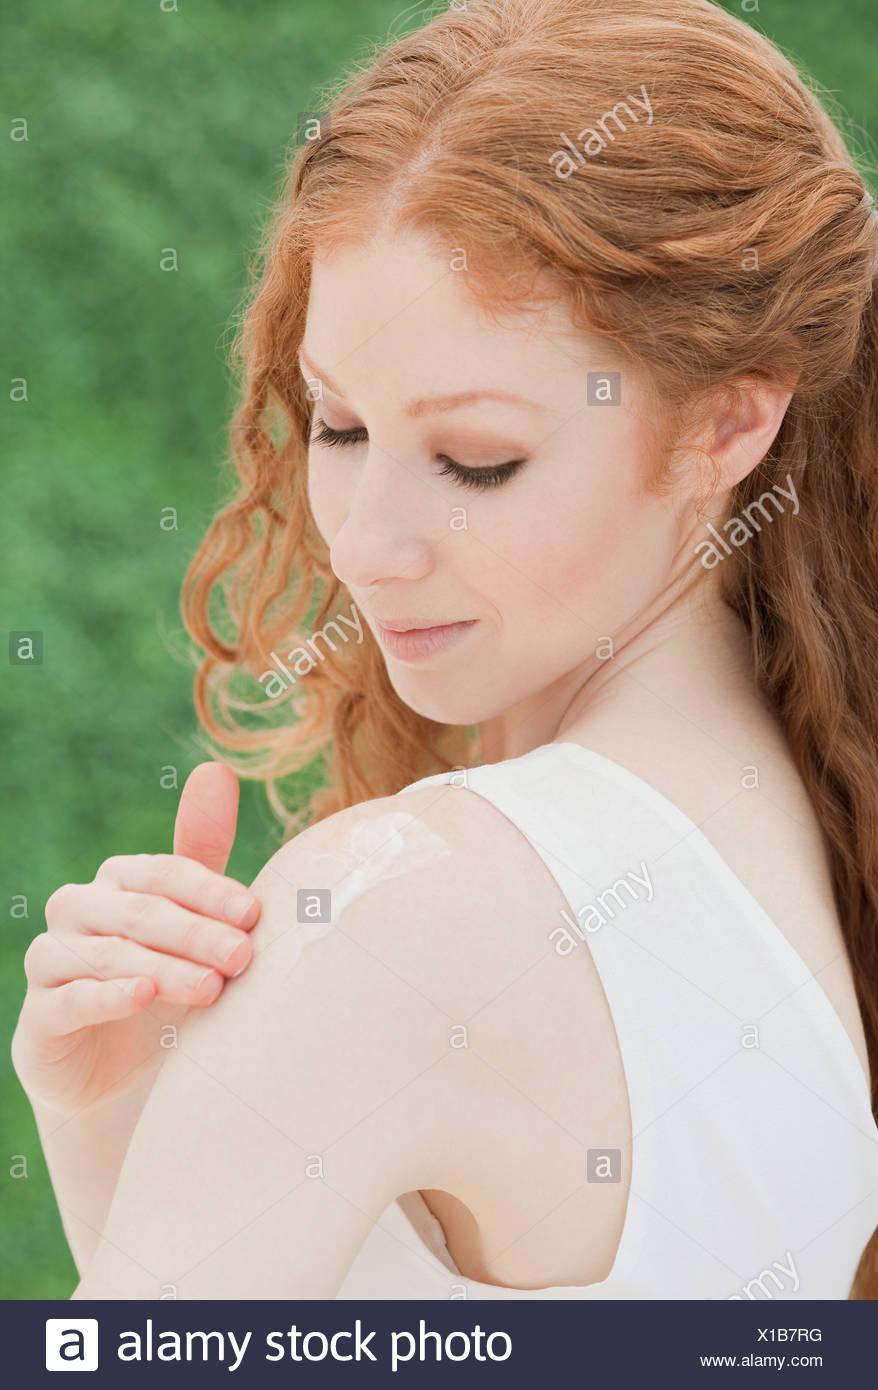 Woman applying lotion - Stock Image